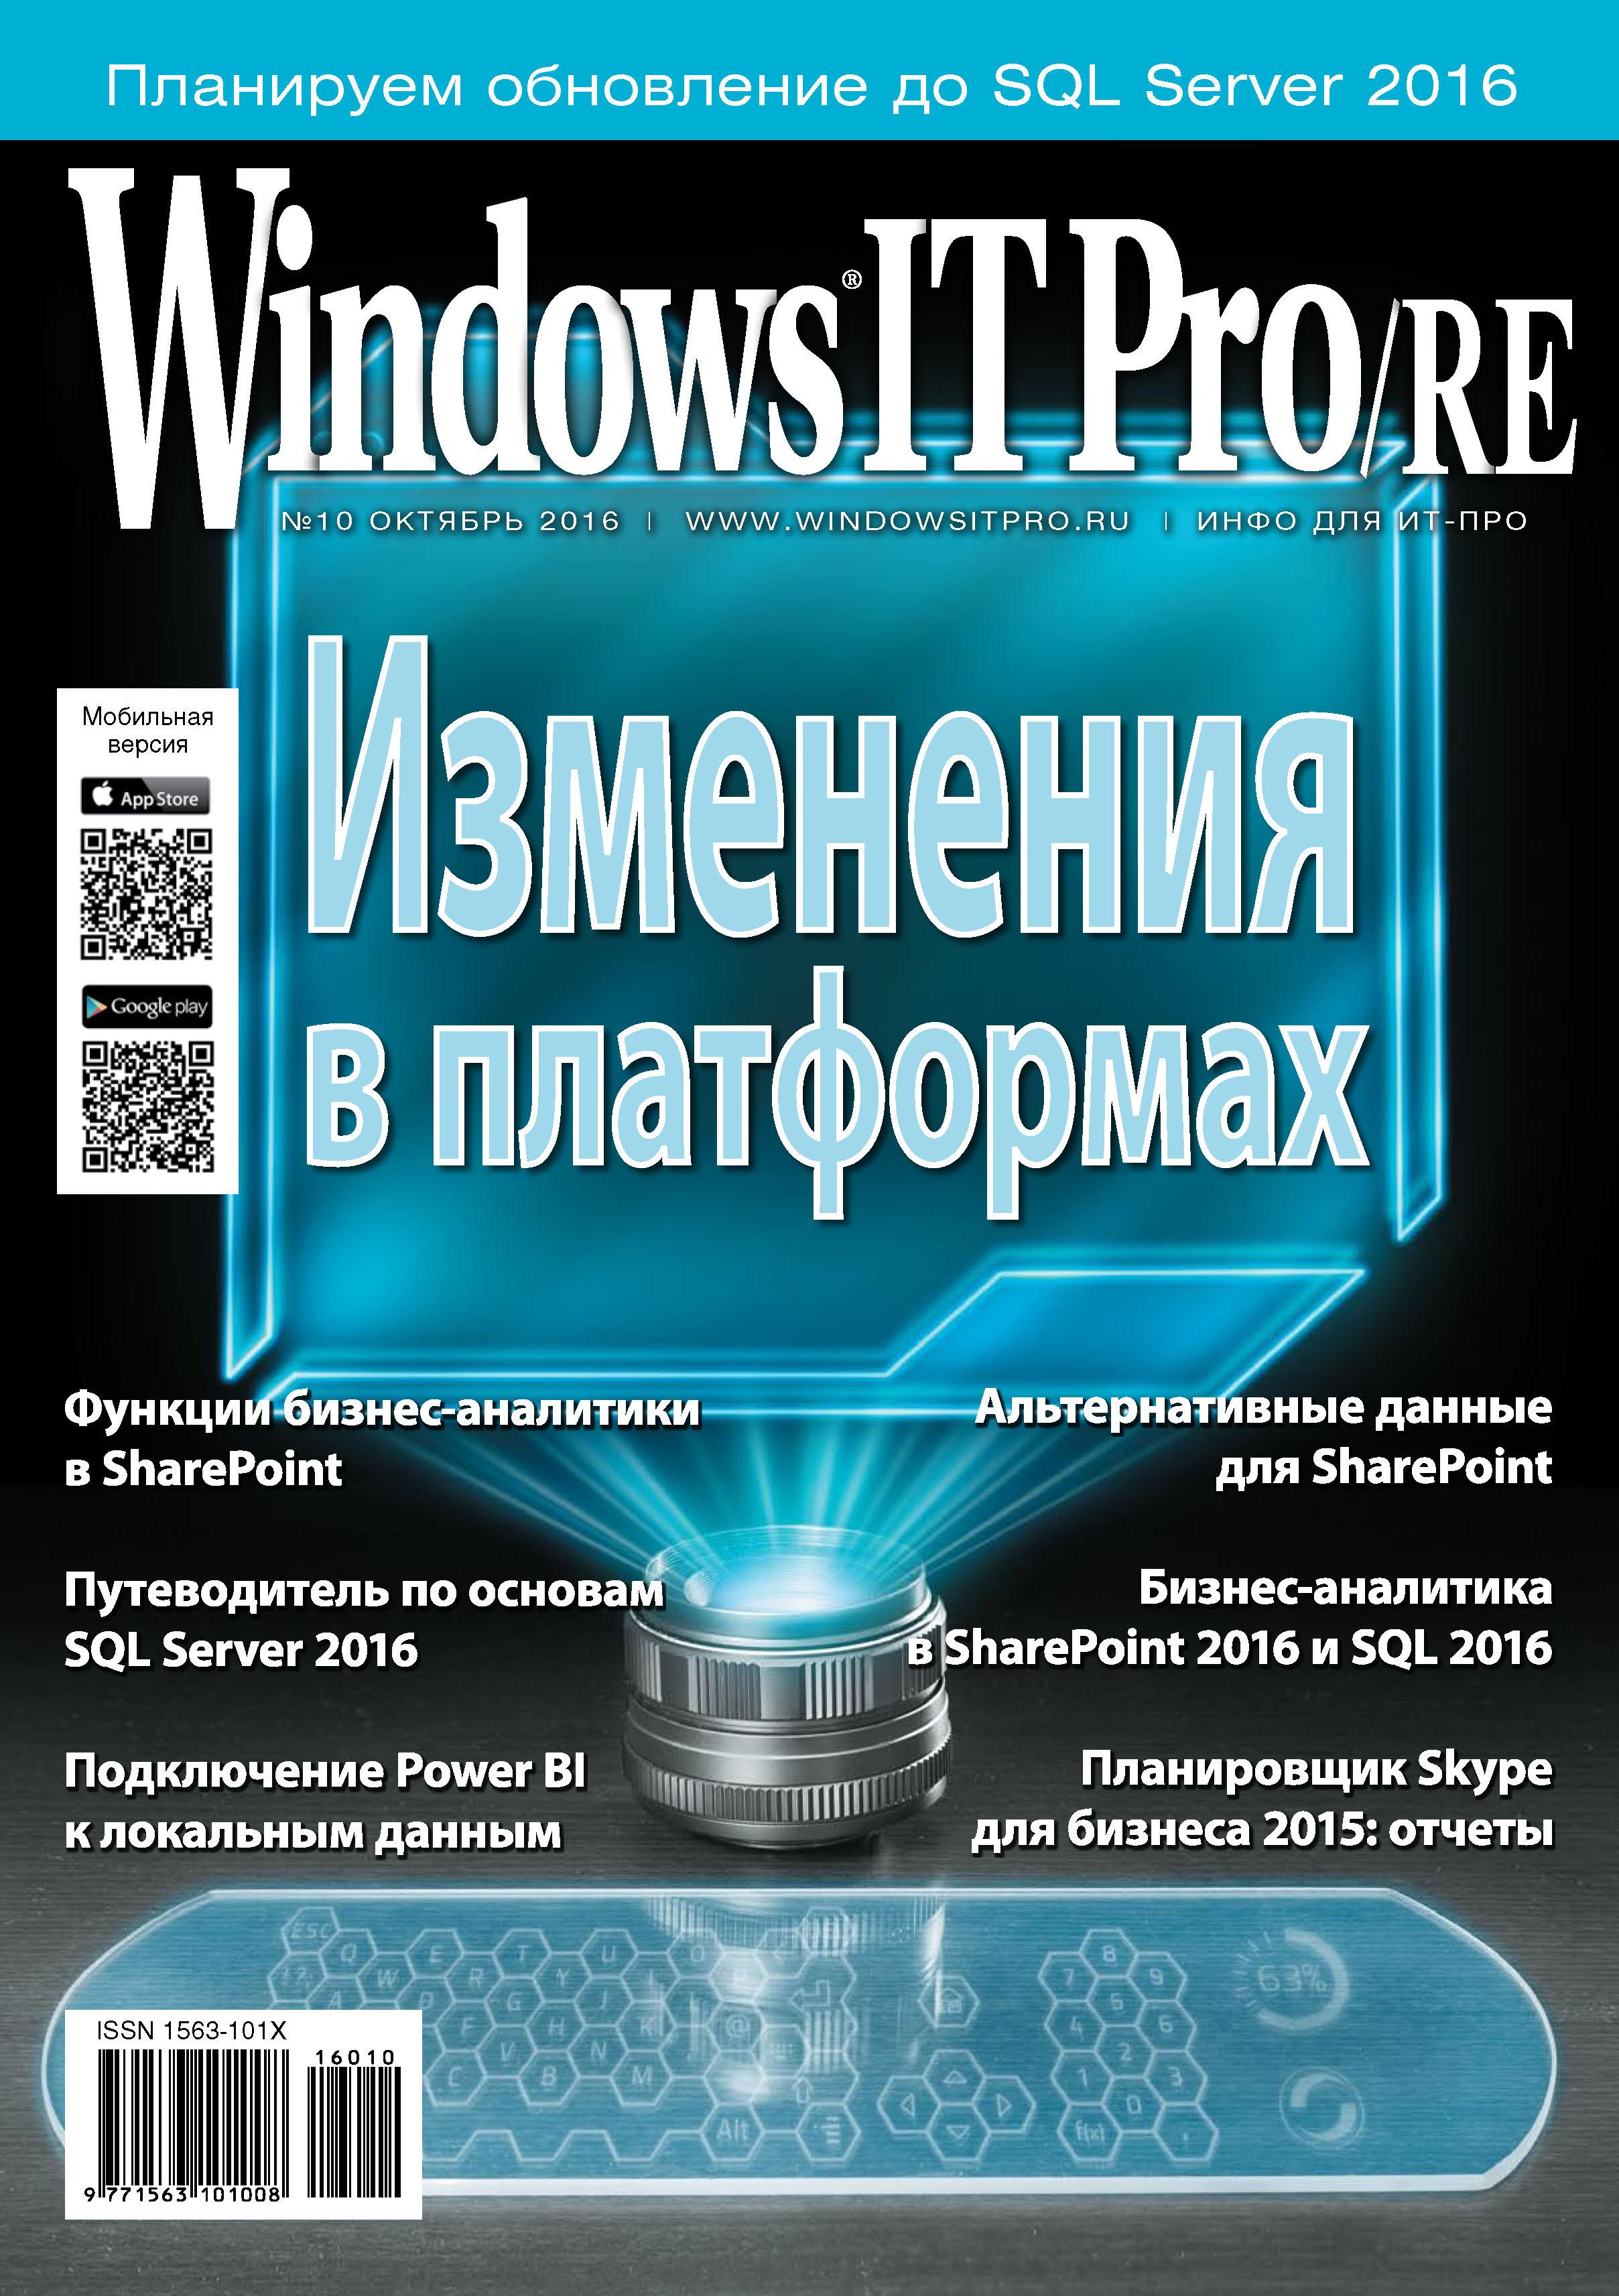 Открытые системы Windows IT Pro/RE №10/2016